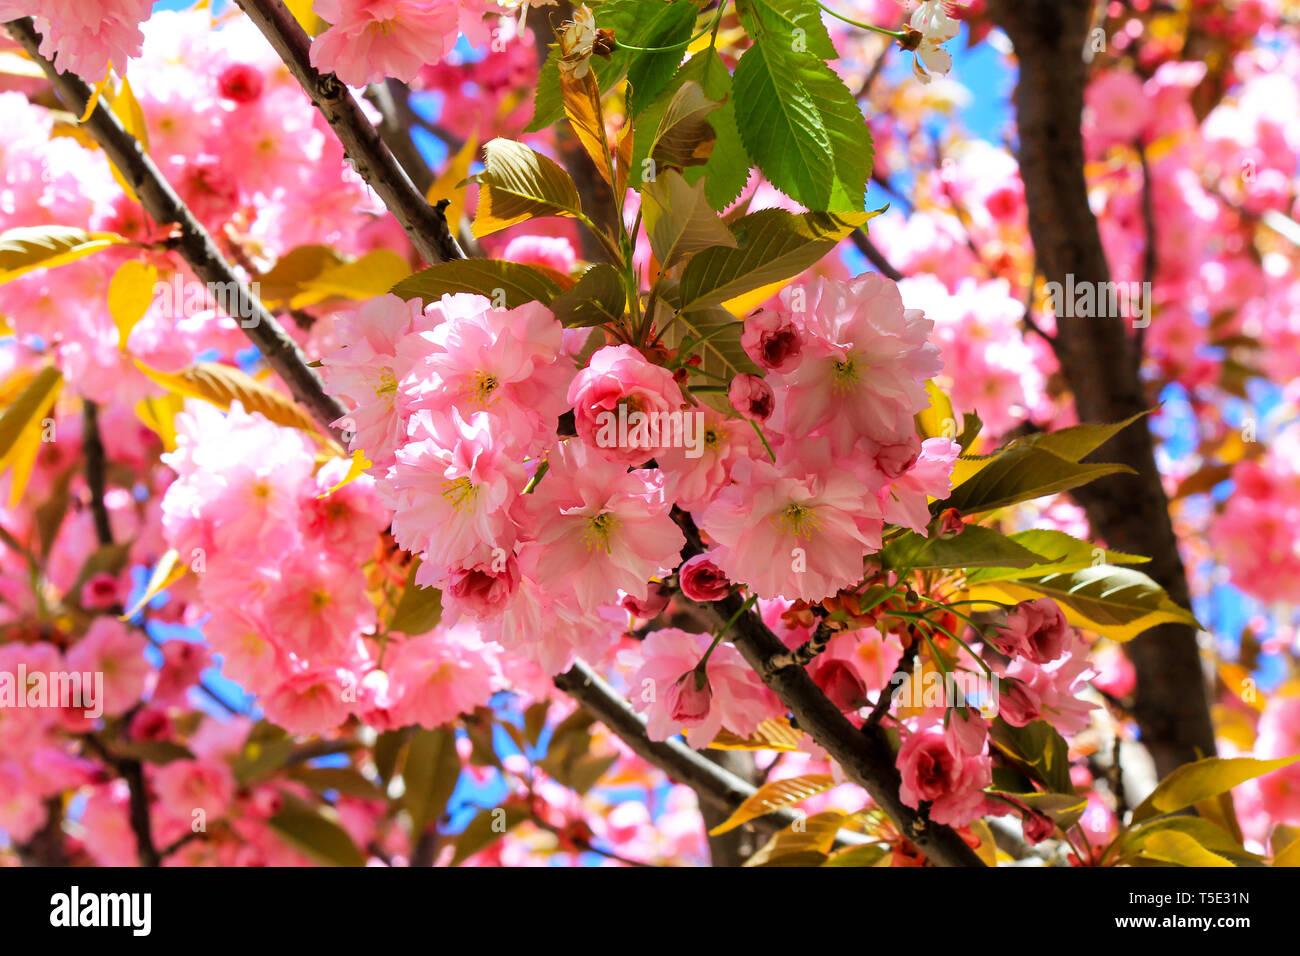 Beautiful Pink Flowers Of Sakura Japanese Cherry Blossomed In